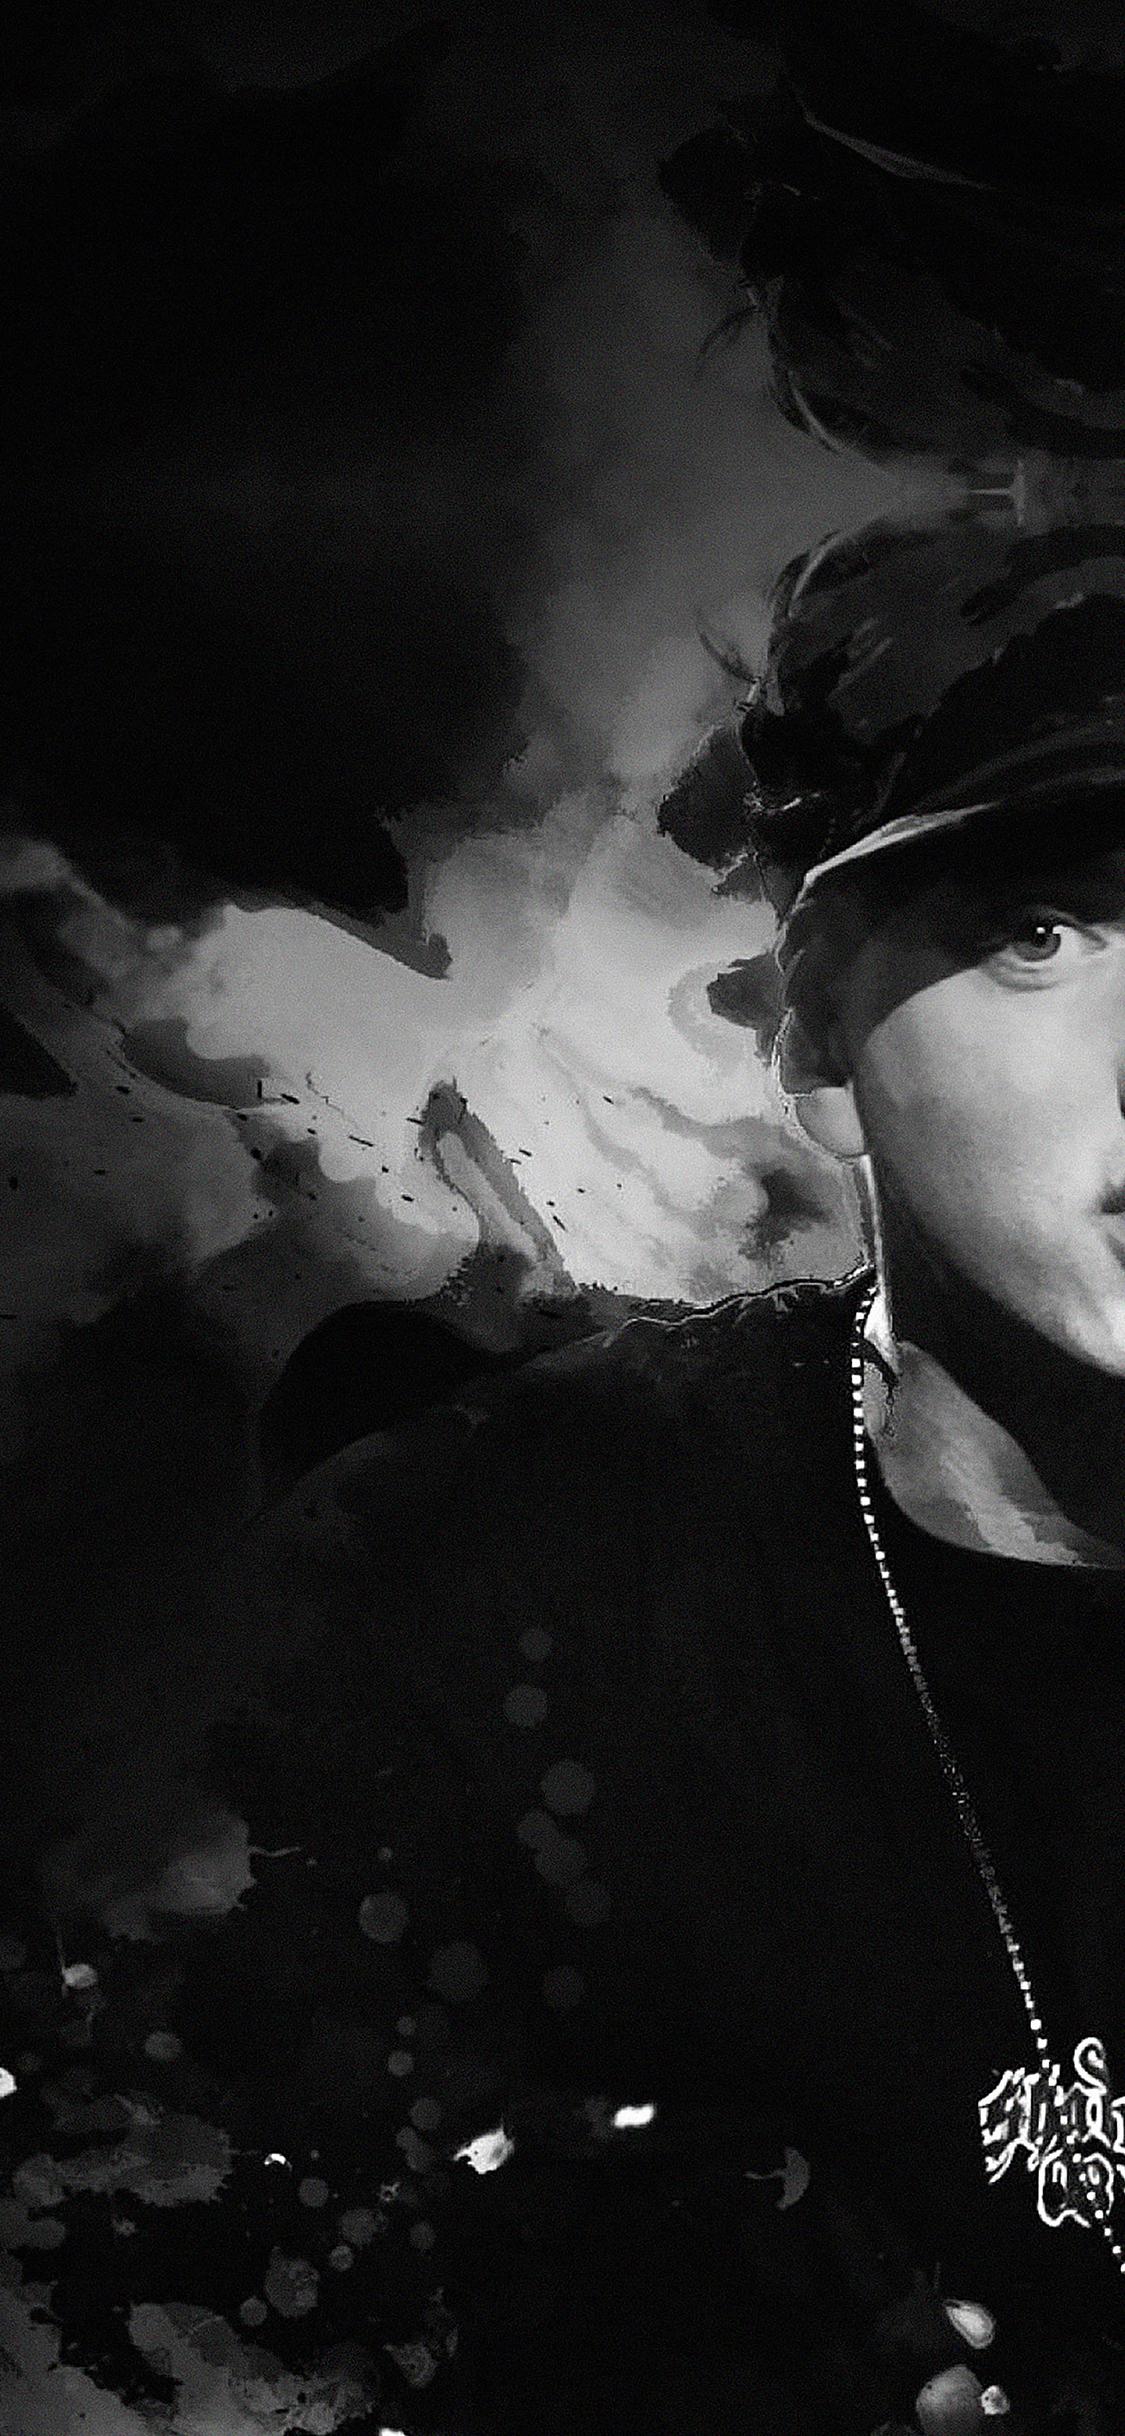 Papersco Iphone Wallpaper Ha50 Wallpaper Eminem Music Face